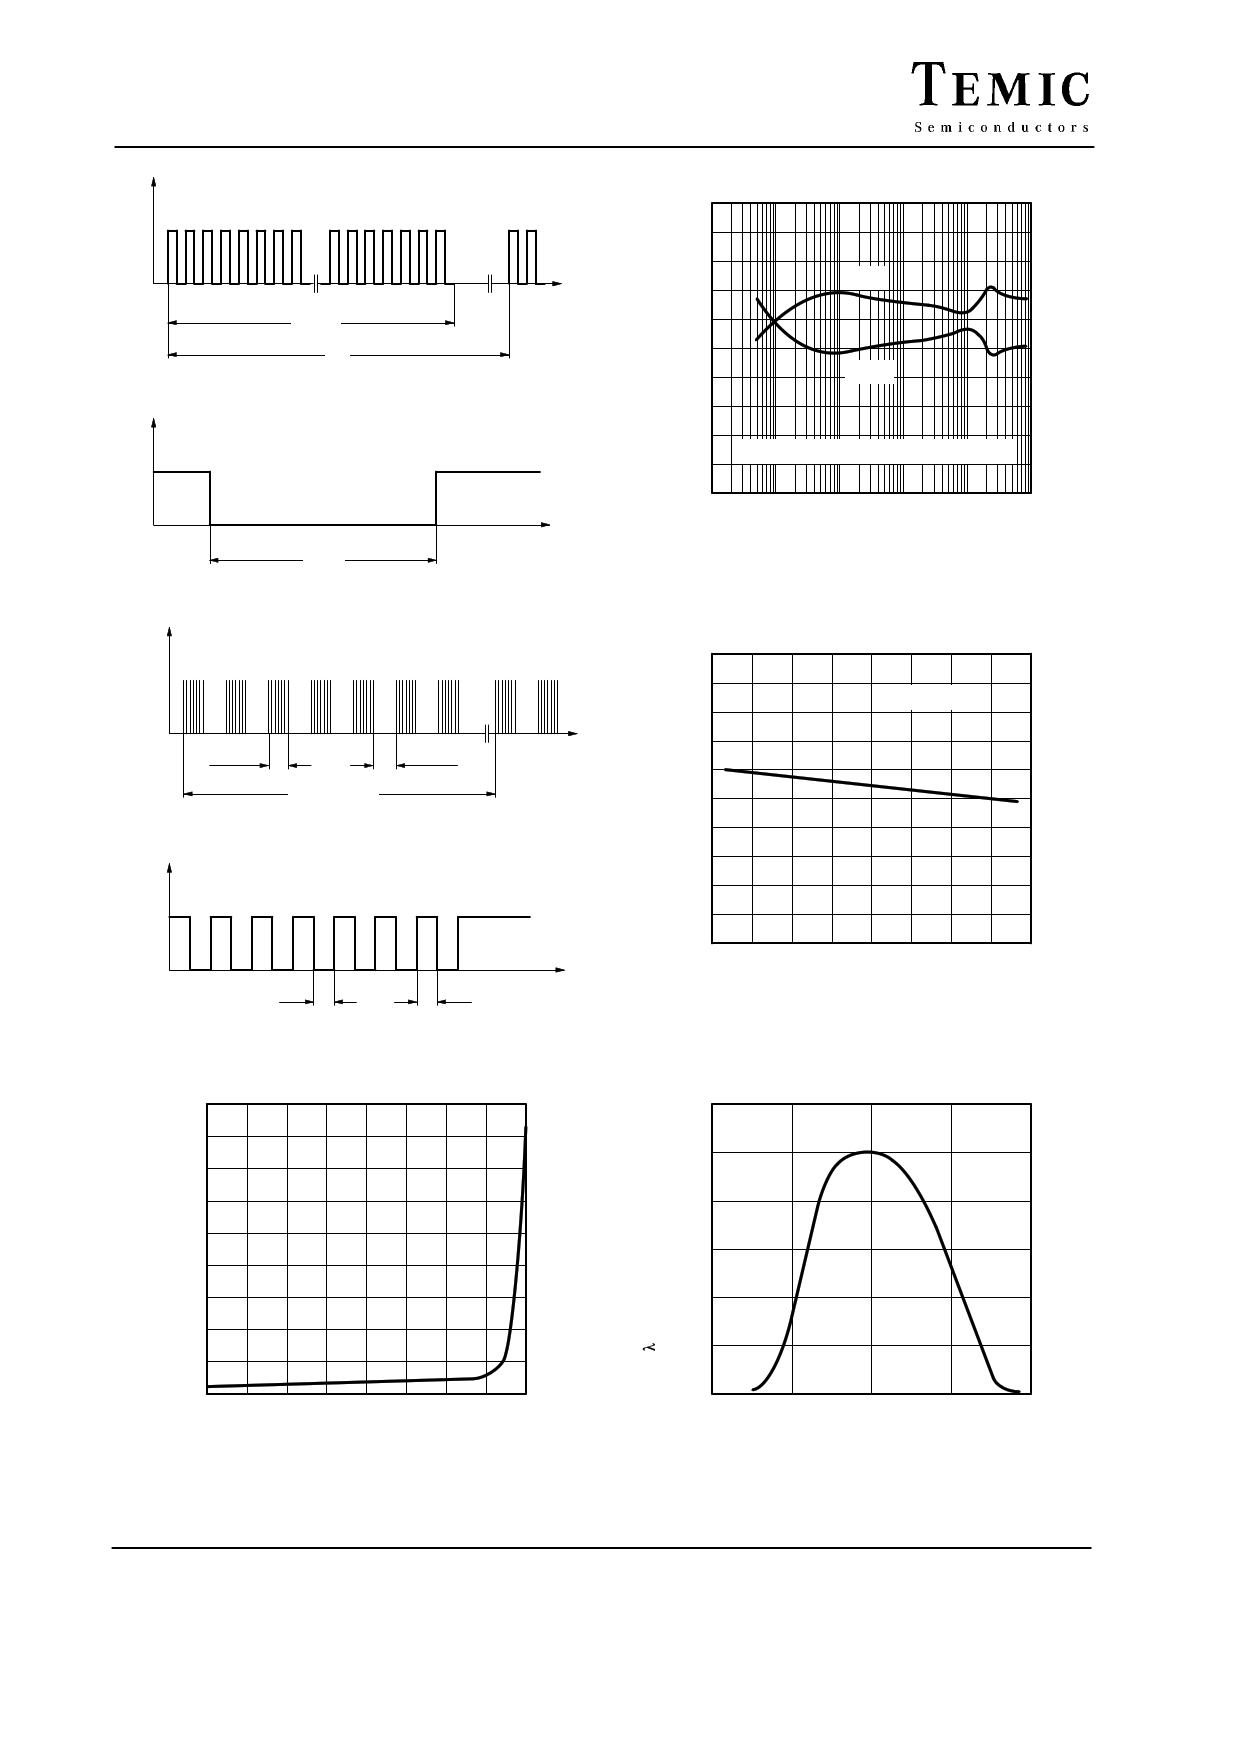 TFMT5370 pdf, 반도체, 판매, 대치품